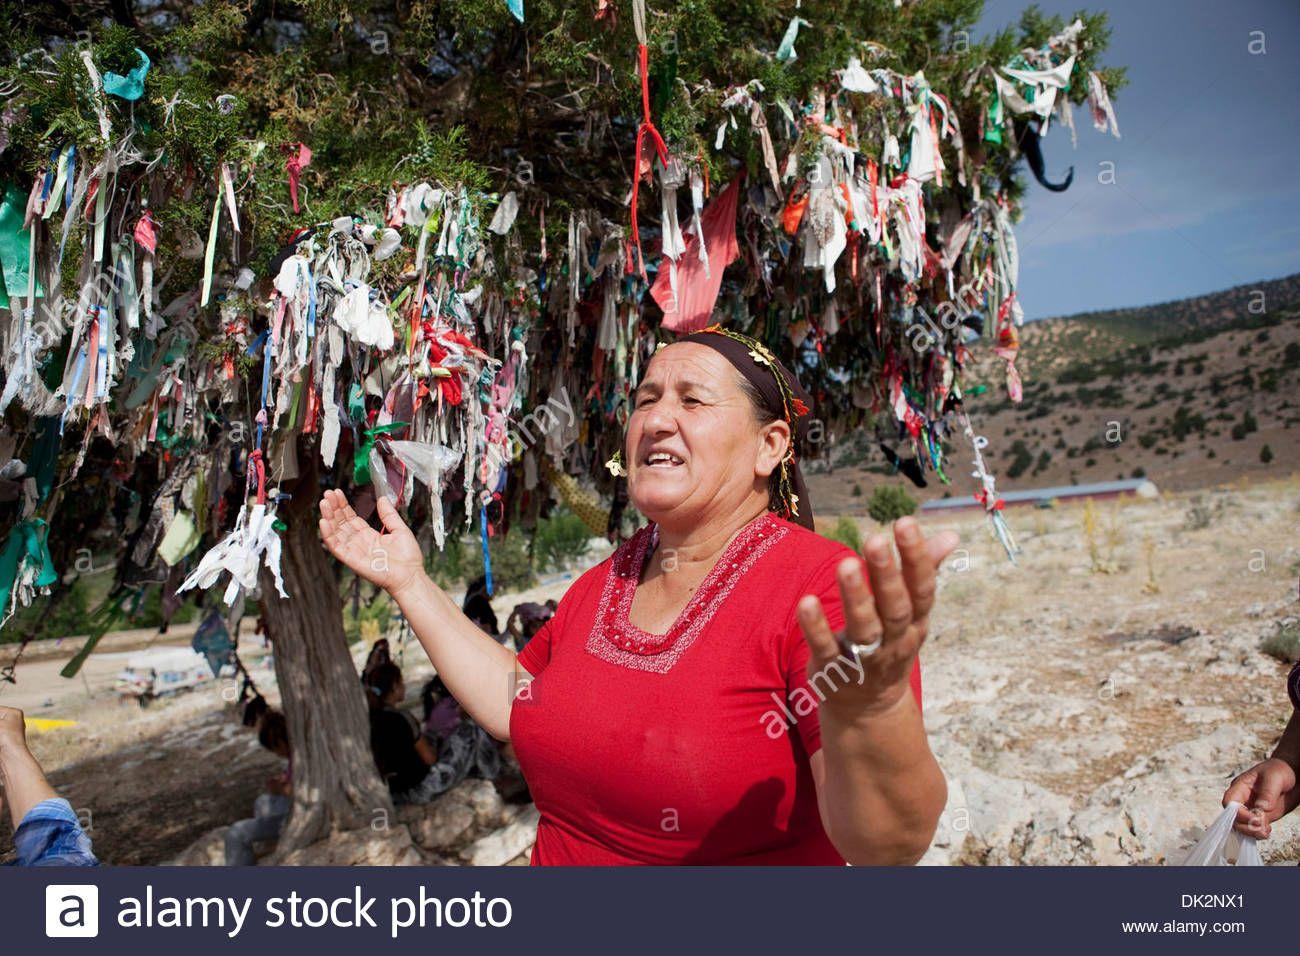 Download This Stock Image Alevi People Tying Ribbons On A Wish Tree In Tekke Ky Abdal Musa Shrine Elmal Antalya Turkey